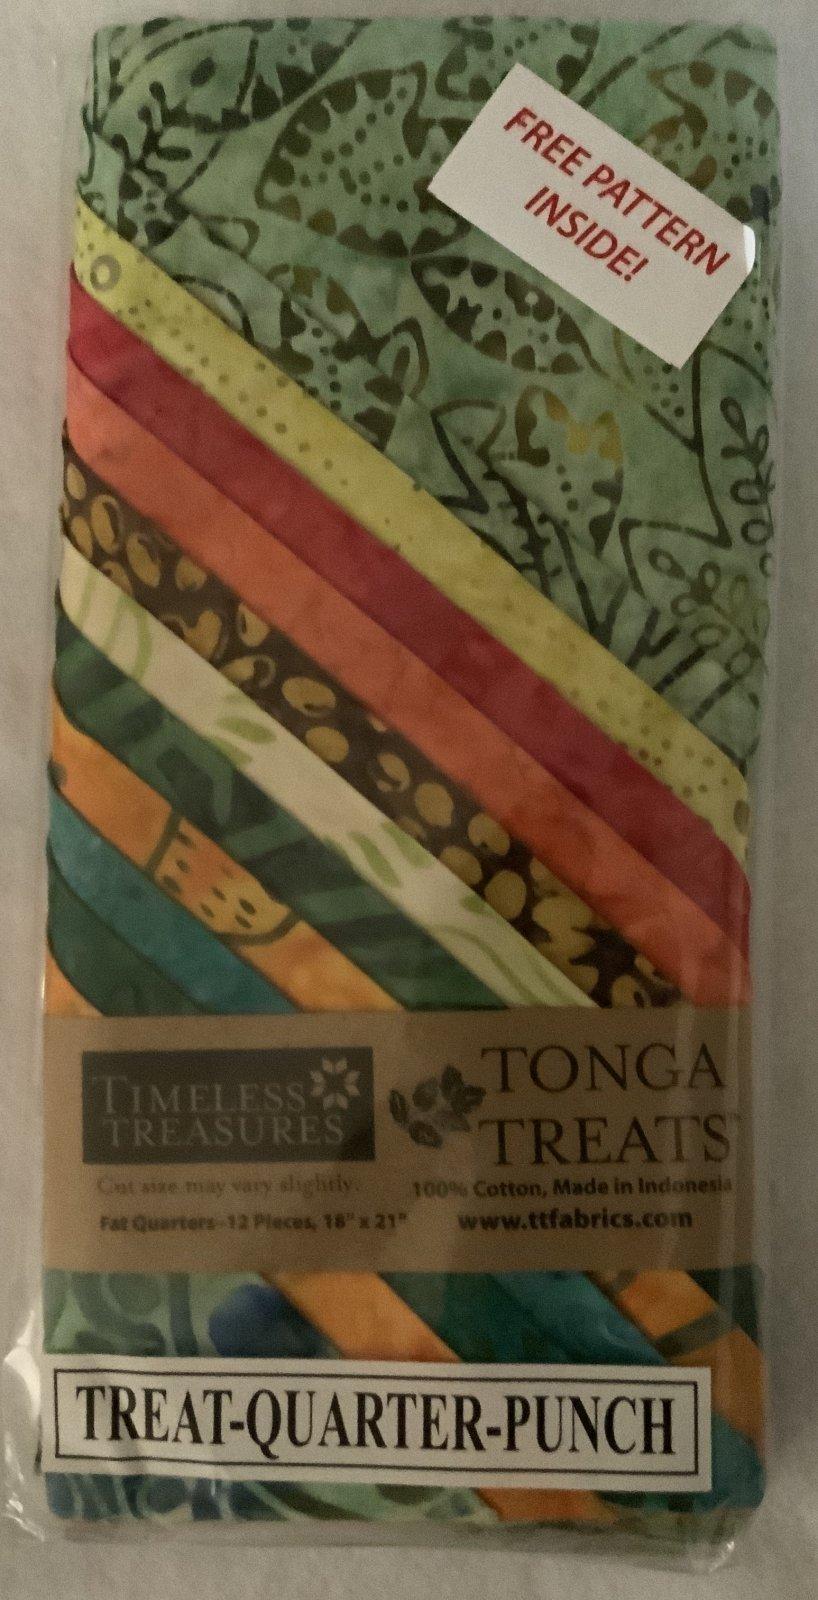 Tonga Treat Fat Quarters Punch (18in x 21in) 12pcs - Timeless Treasures